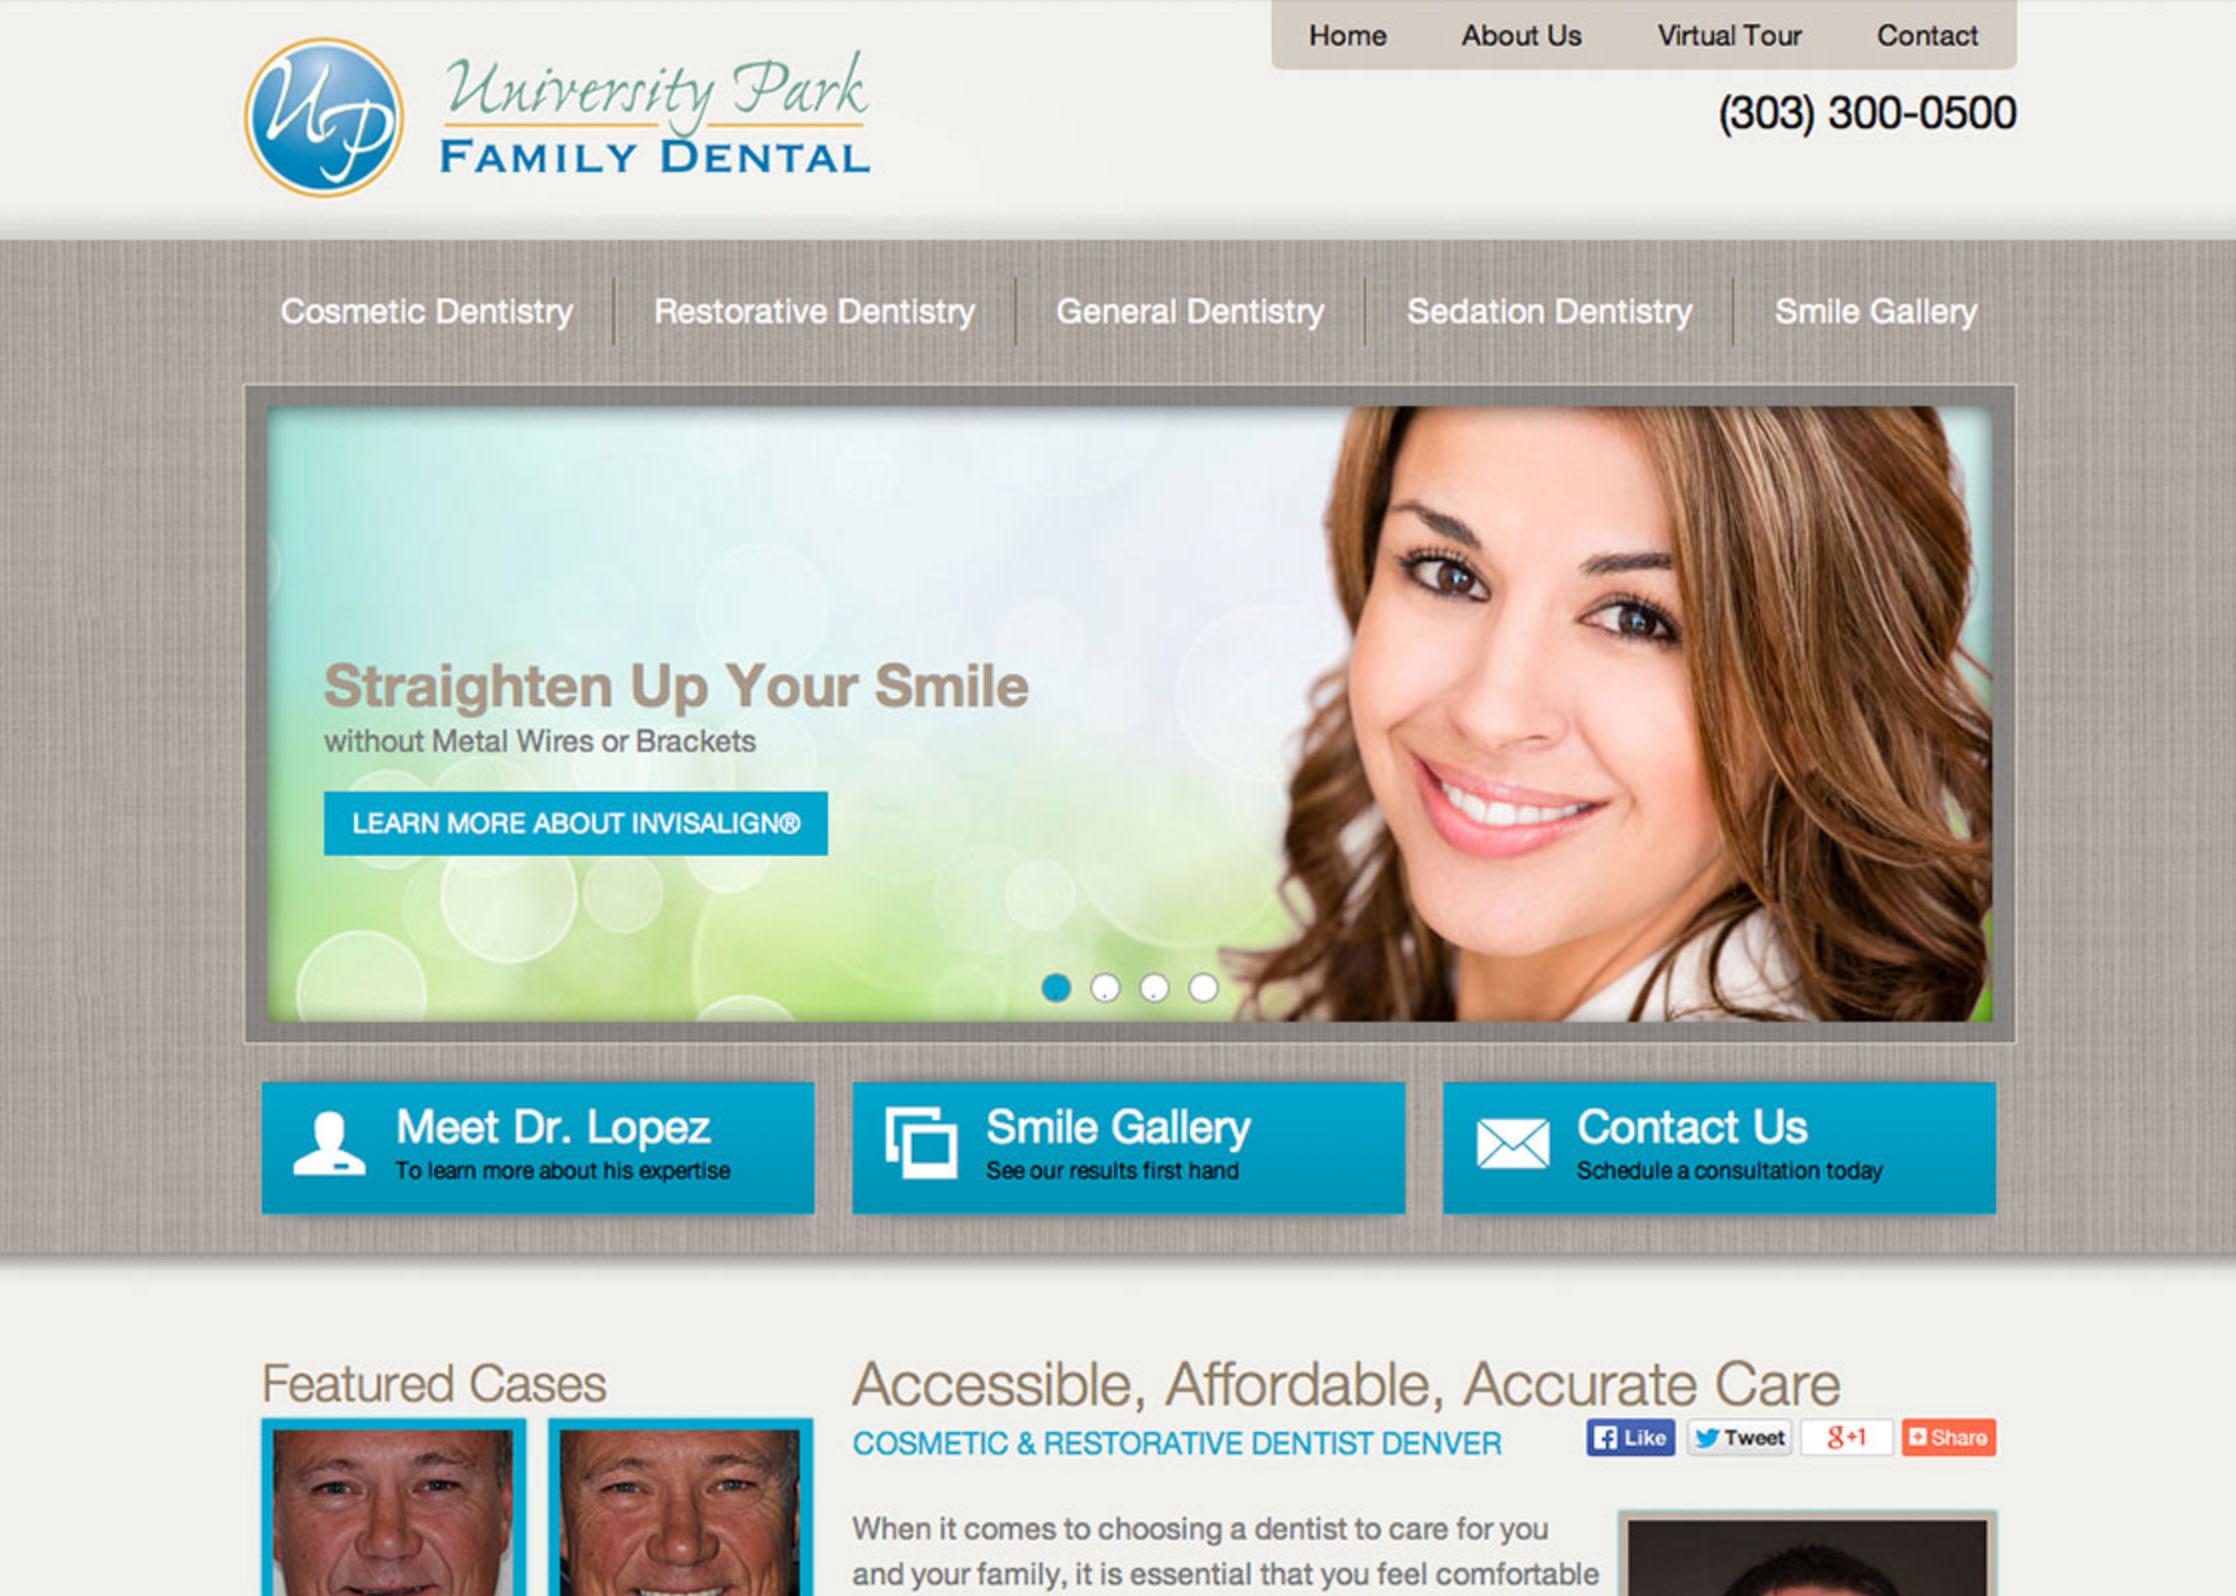 The Big Company – every website looks the same...